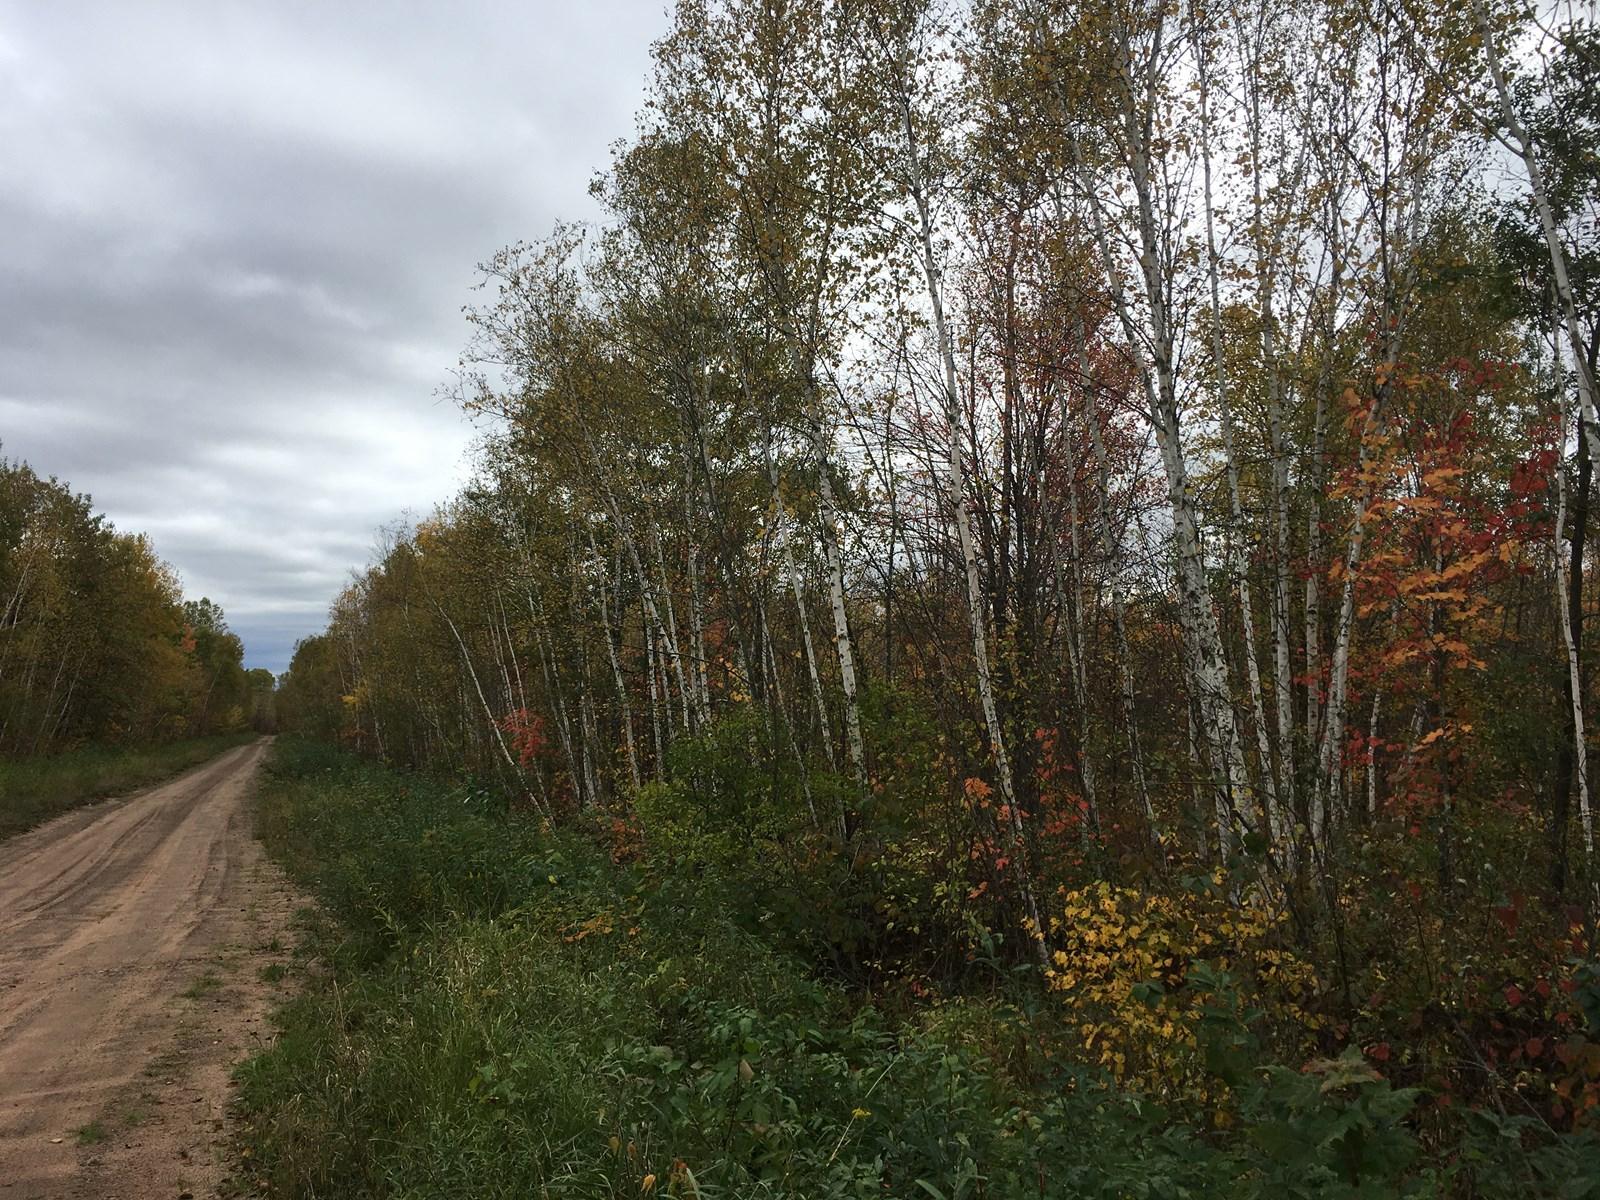 Hinckley, Minnesota Acreage For Sale in Northern Minnesota